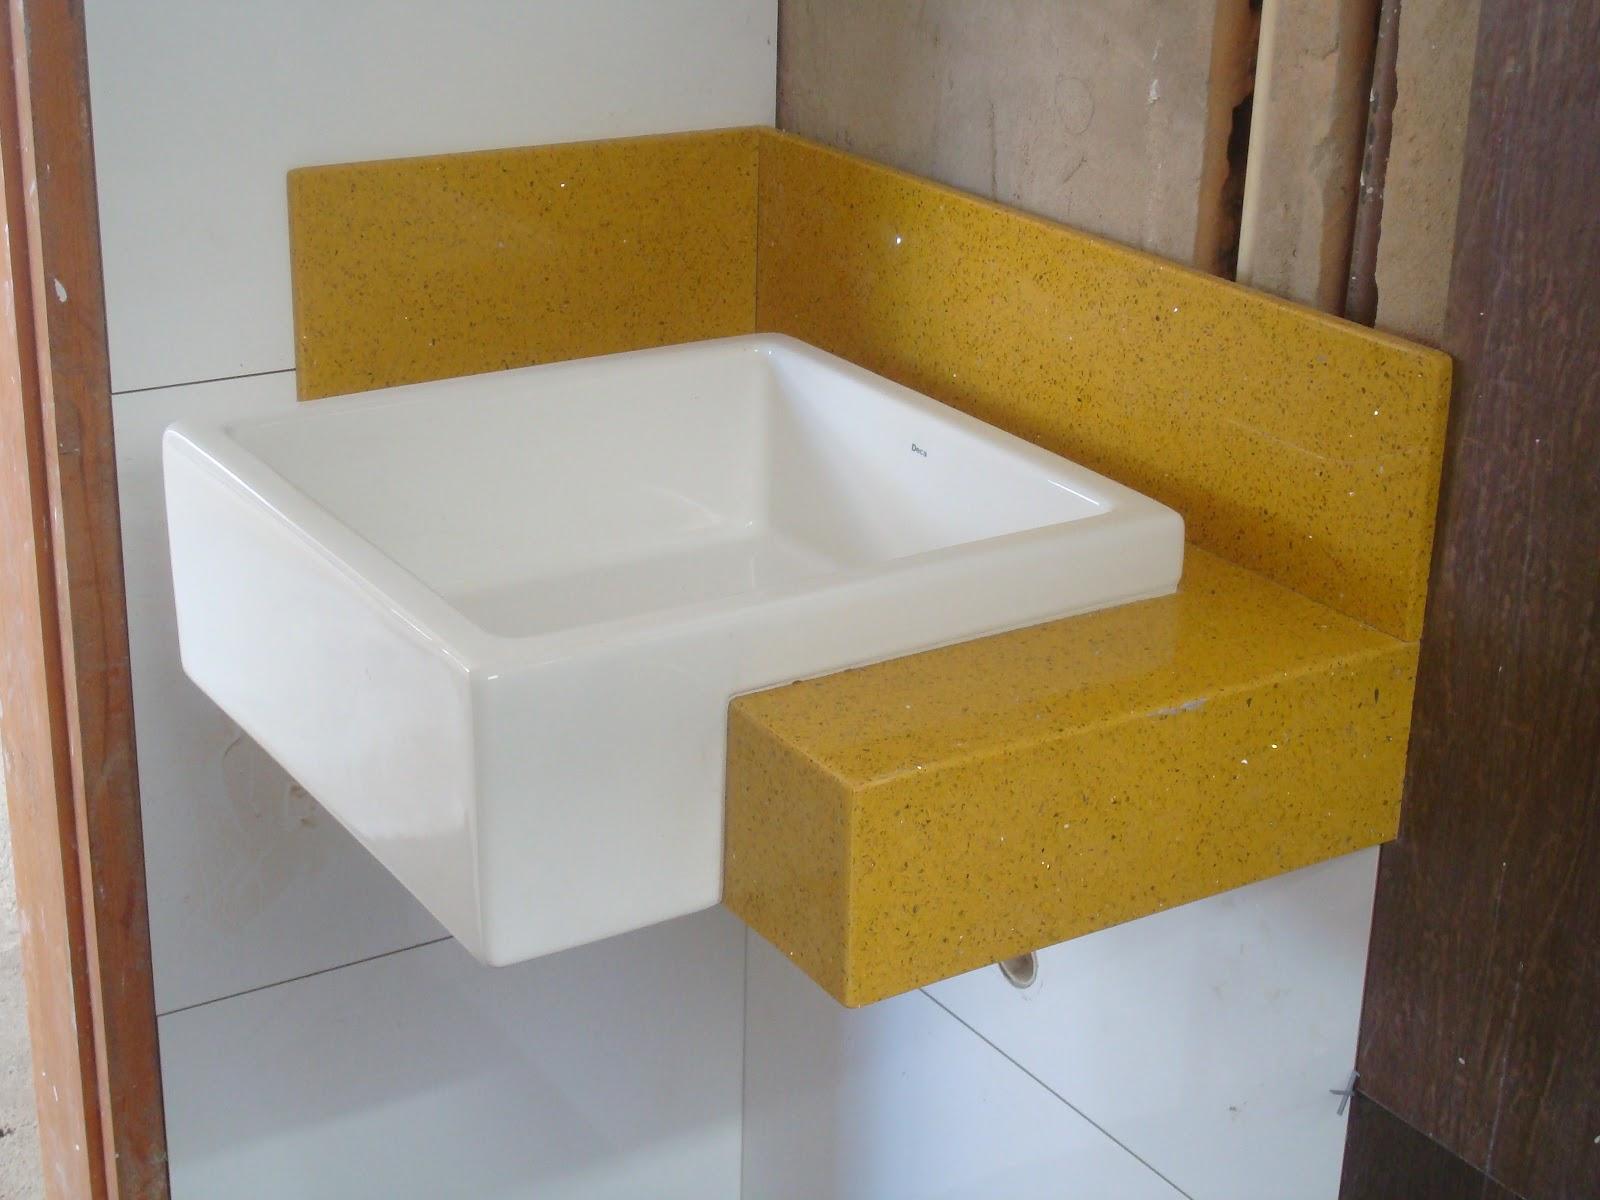 Bancada Silestone amarelo stelar #946F25 1600x1200 Bancada Banheiro Silestone Vermelho